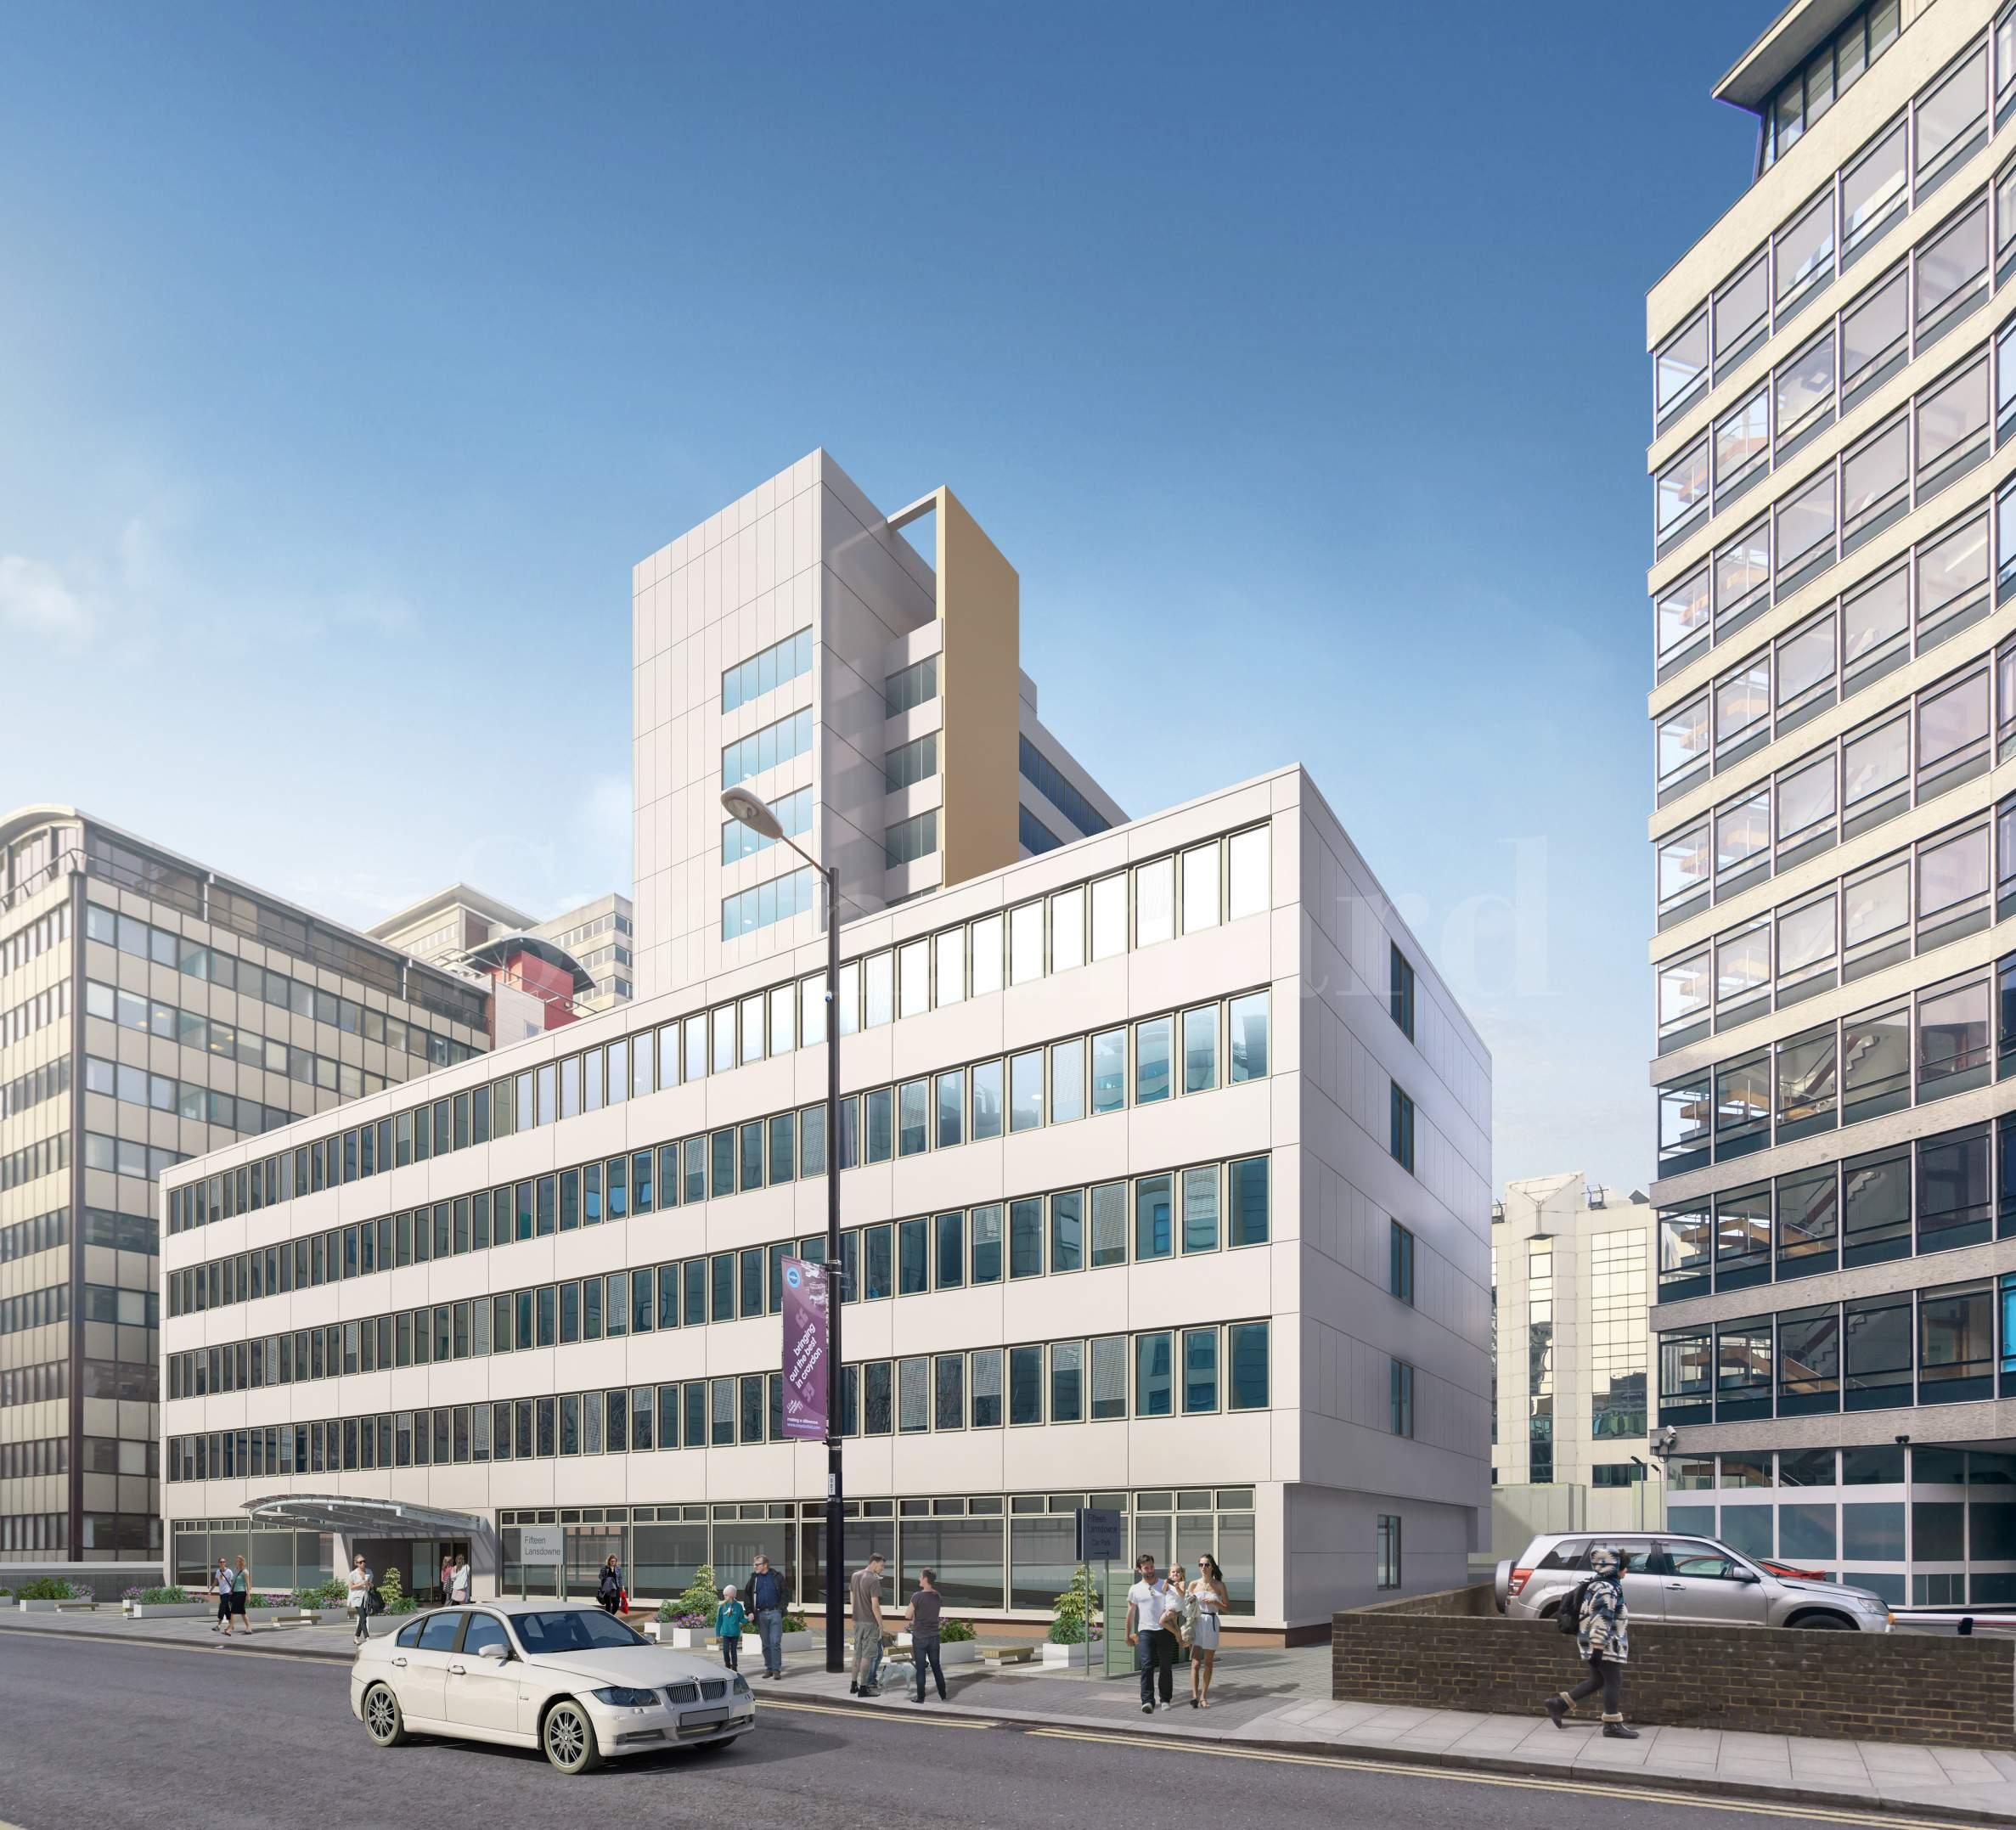 New big development in the heart of Croydon1 - Stonehard